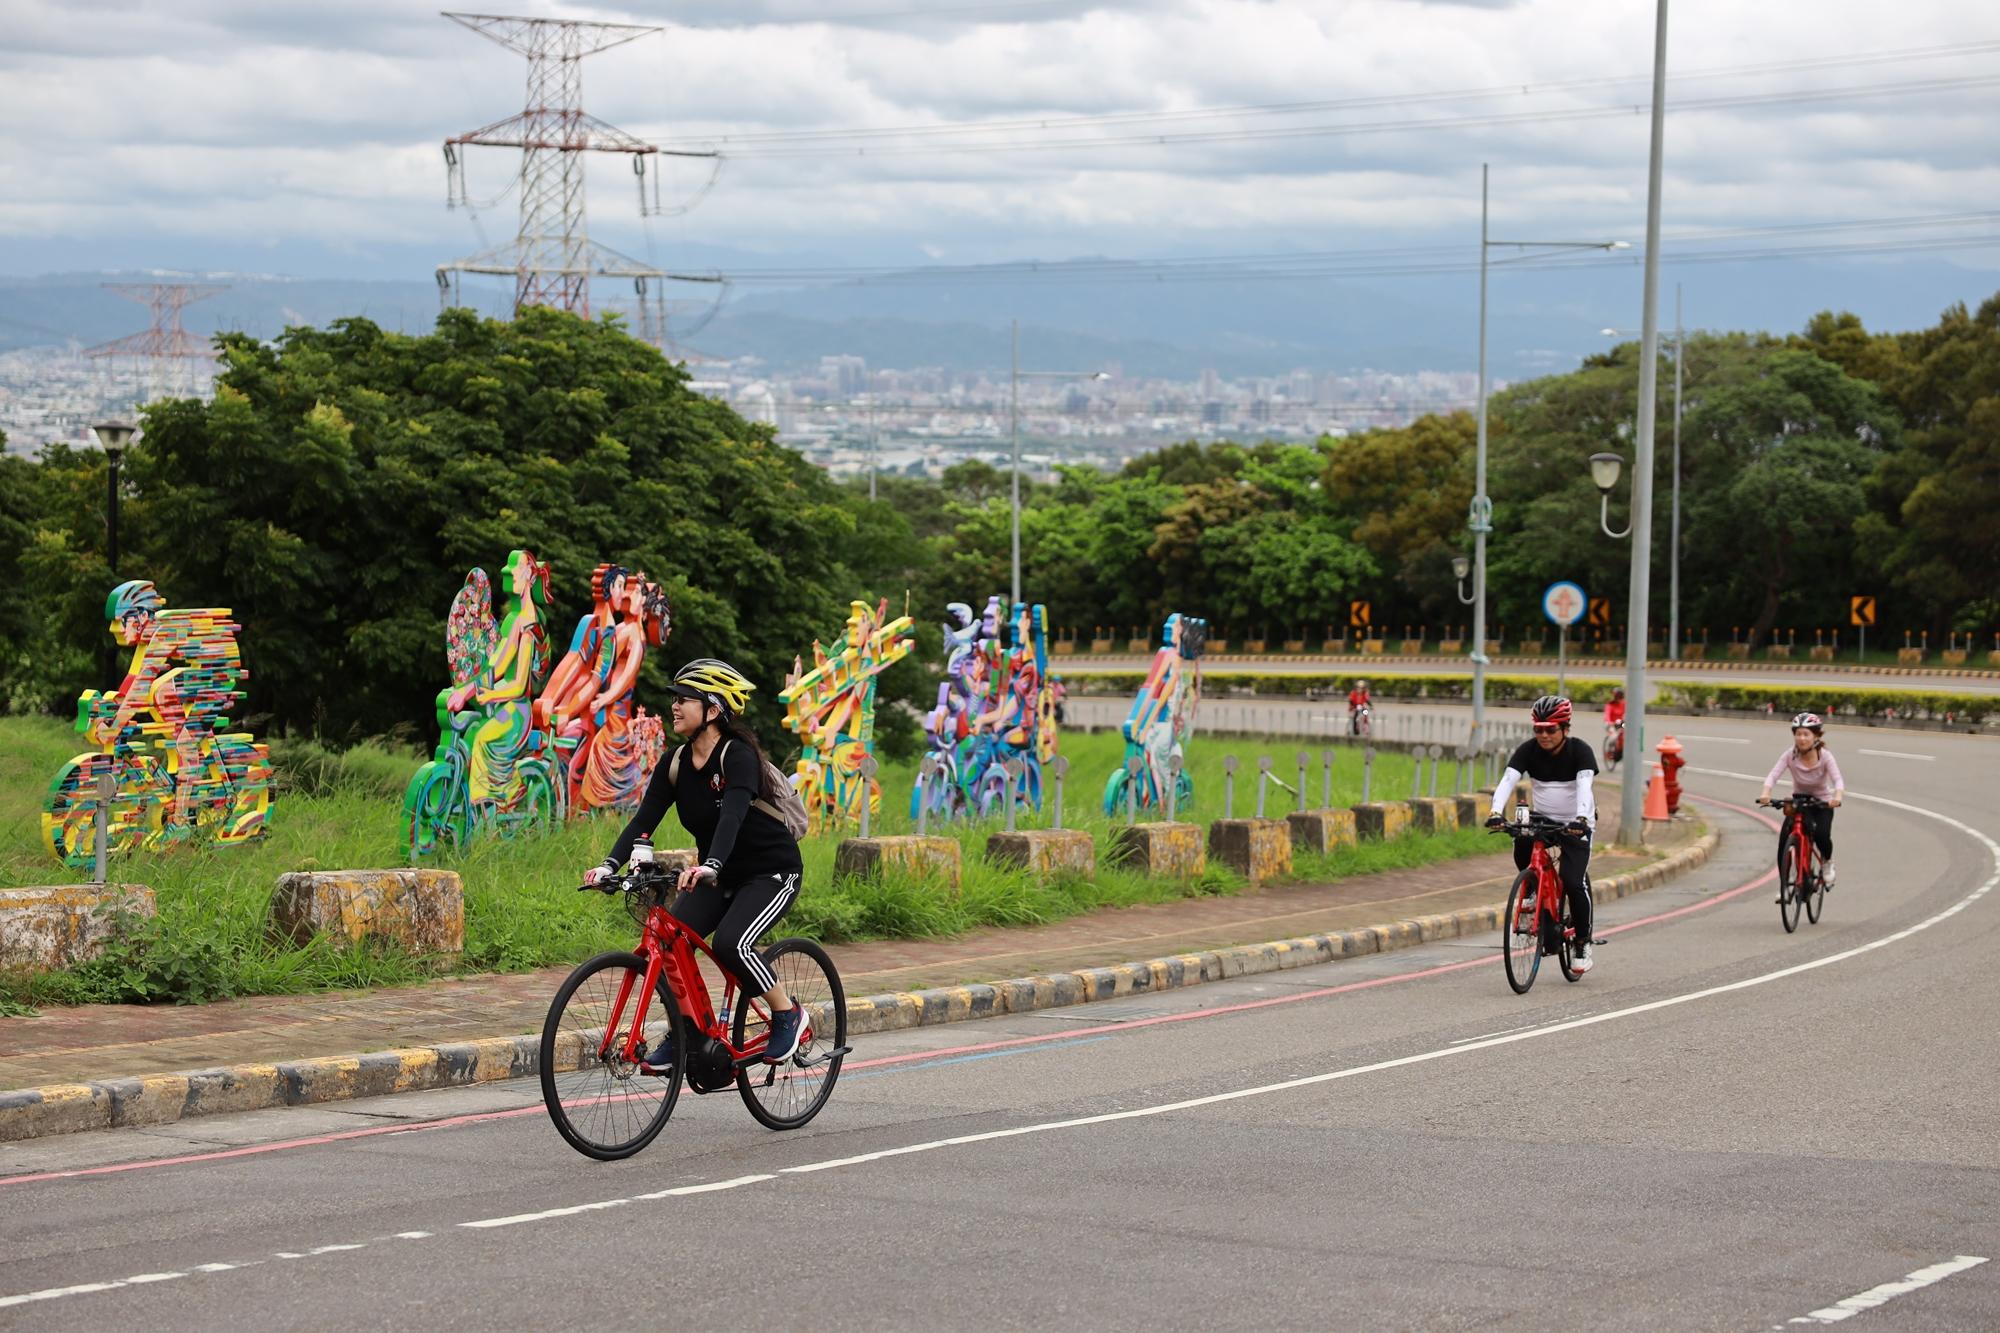 E-Bike騎乘技巧體驗教學